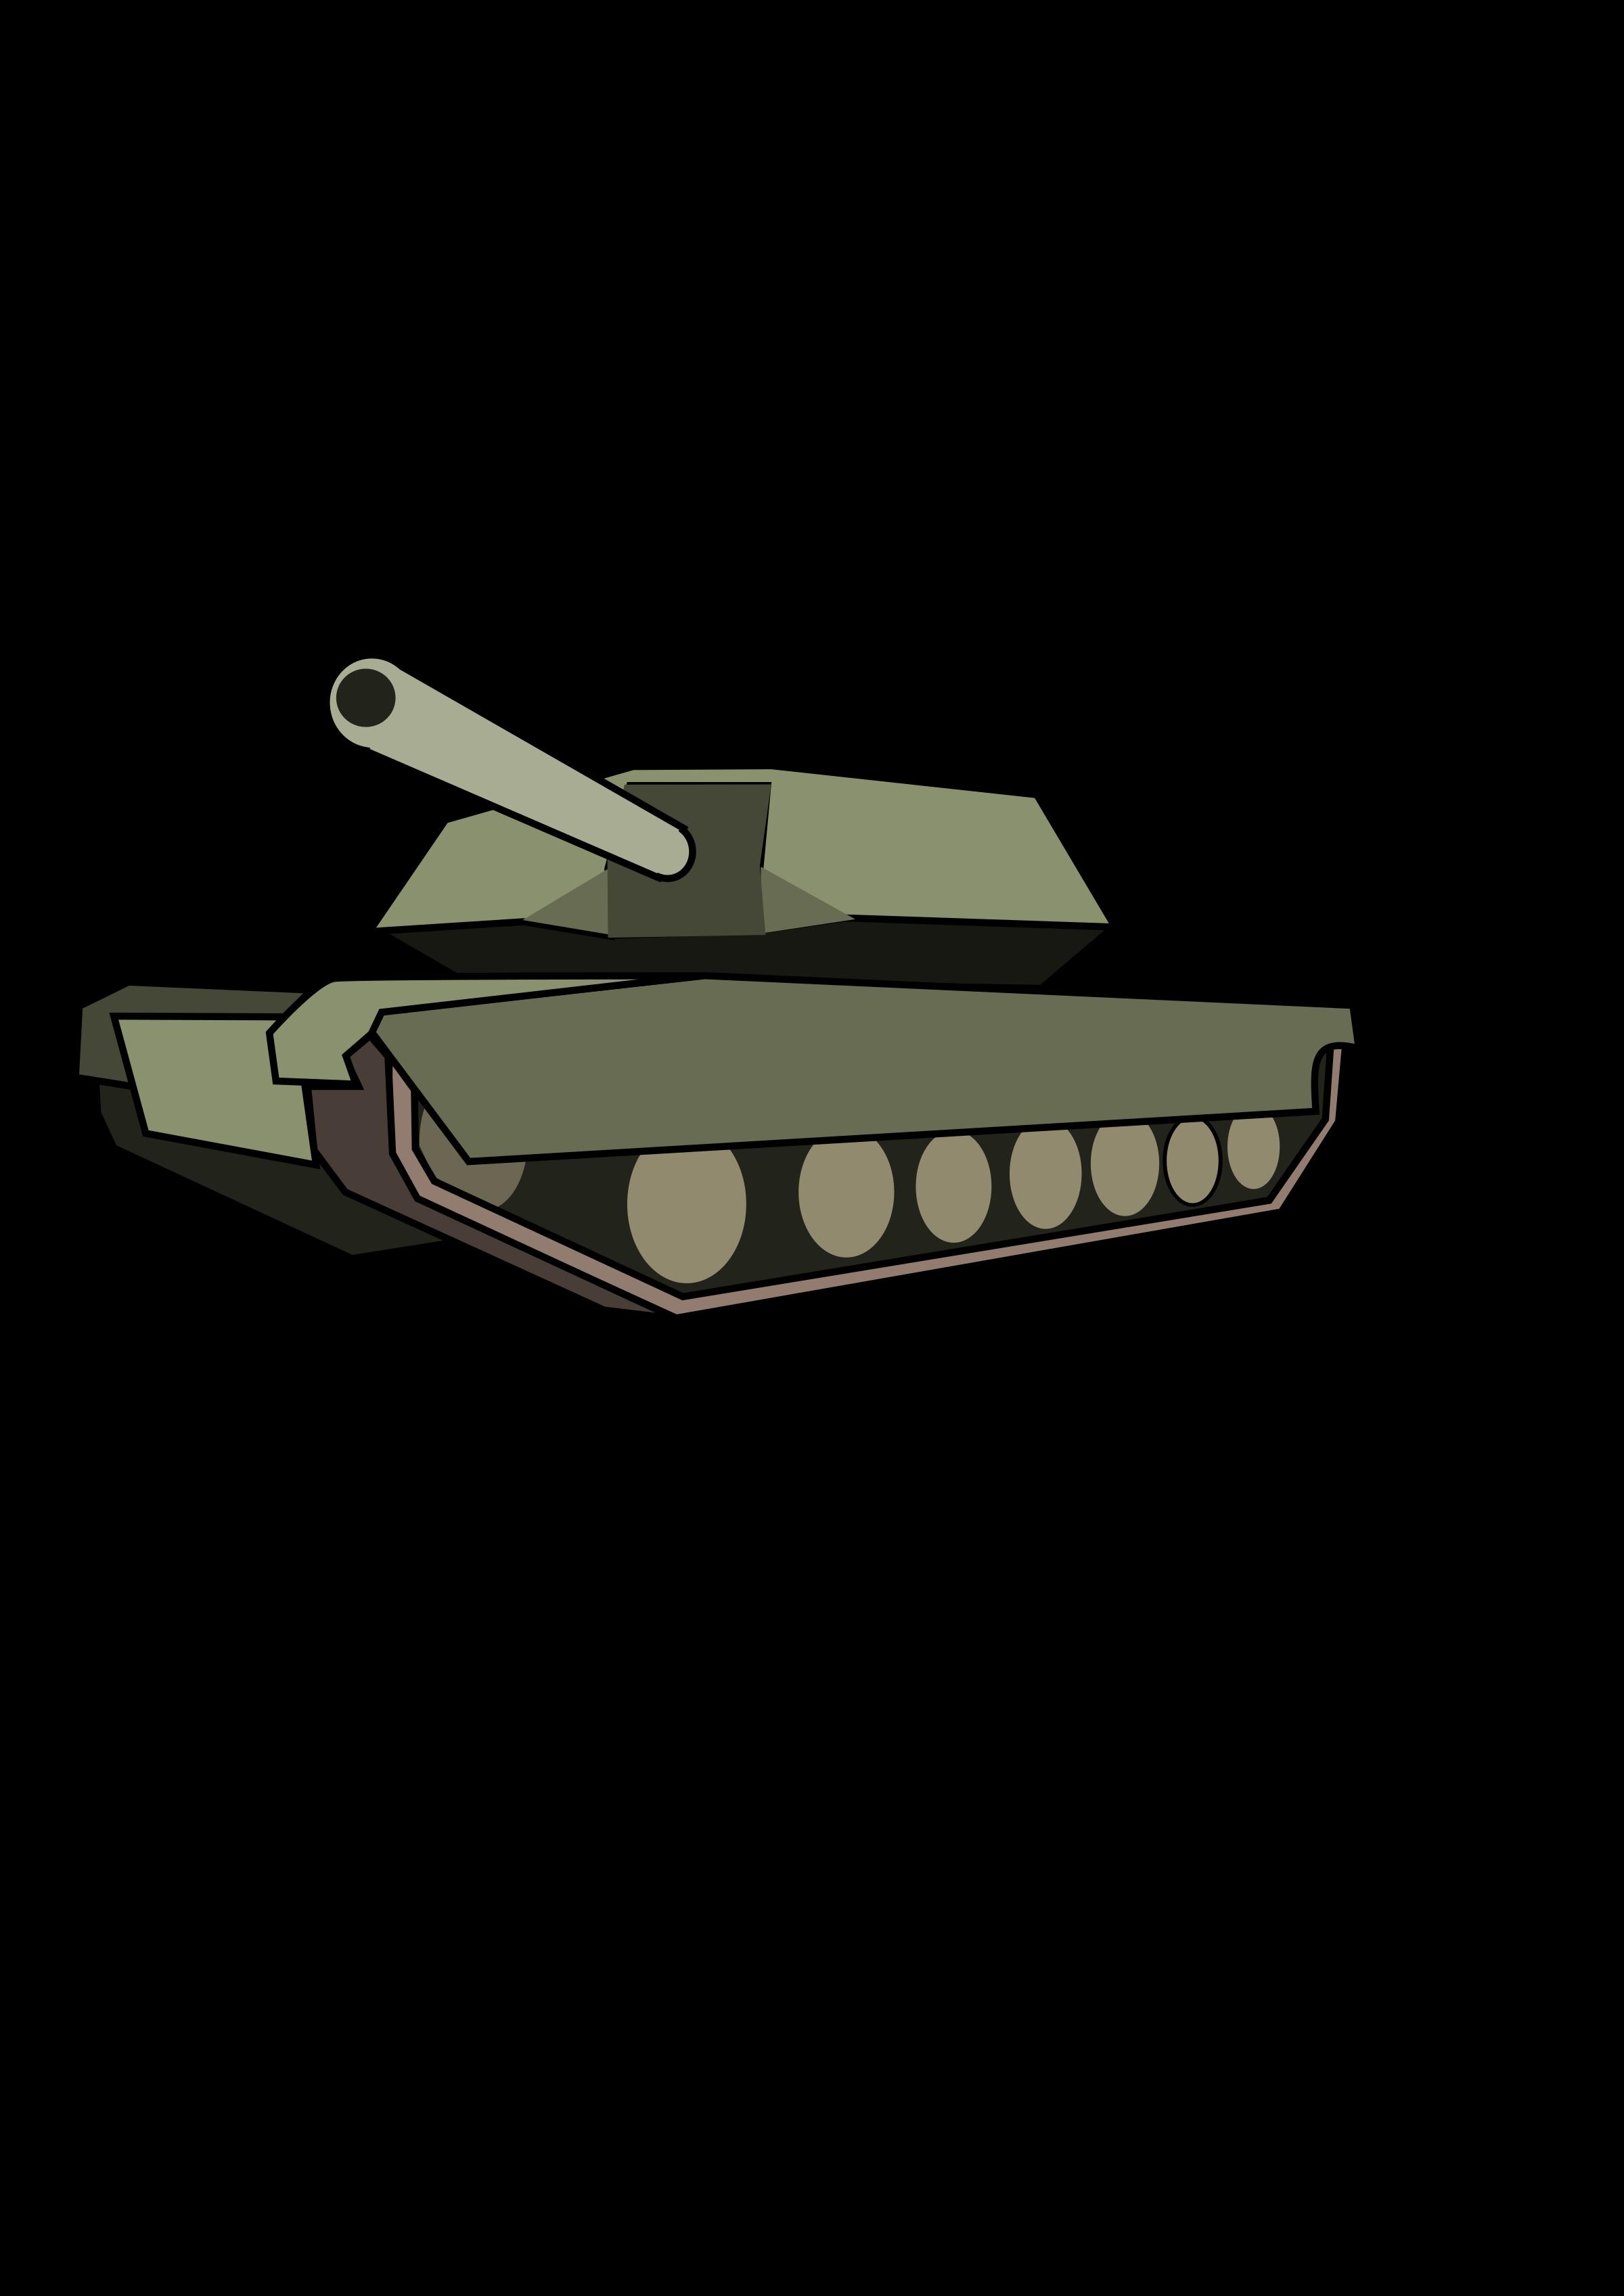 Ww1 Tank Drawing at GetDrawings | Free download